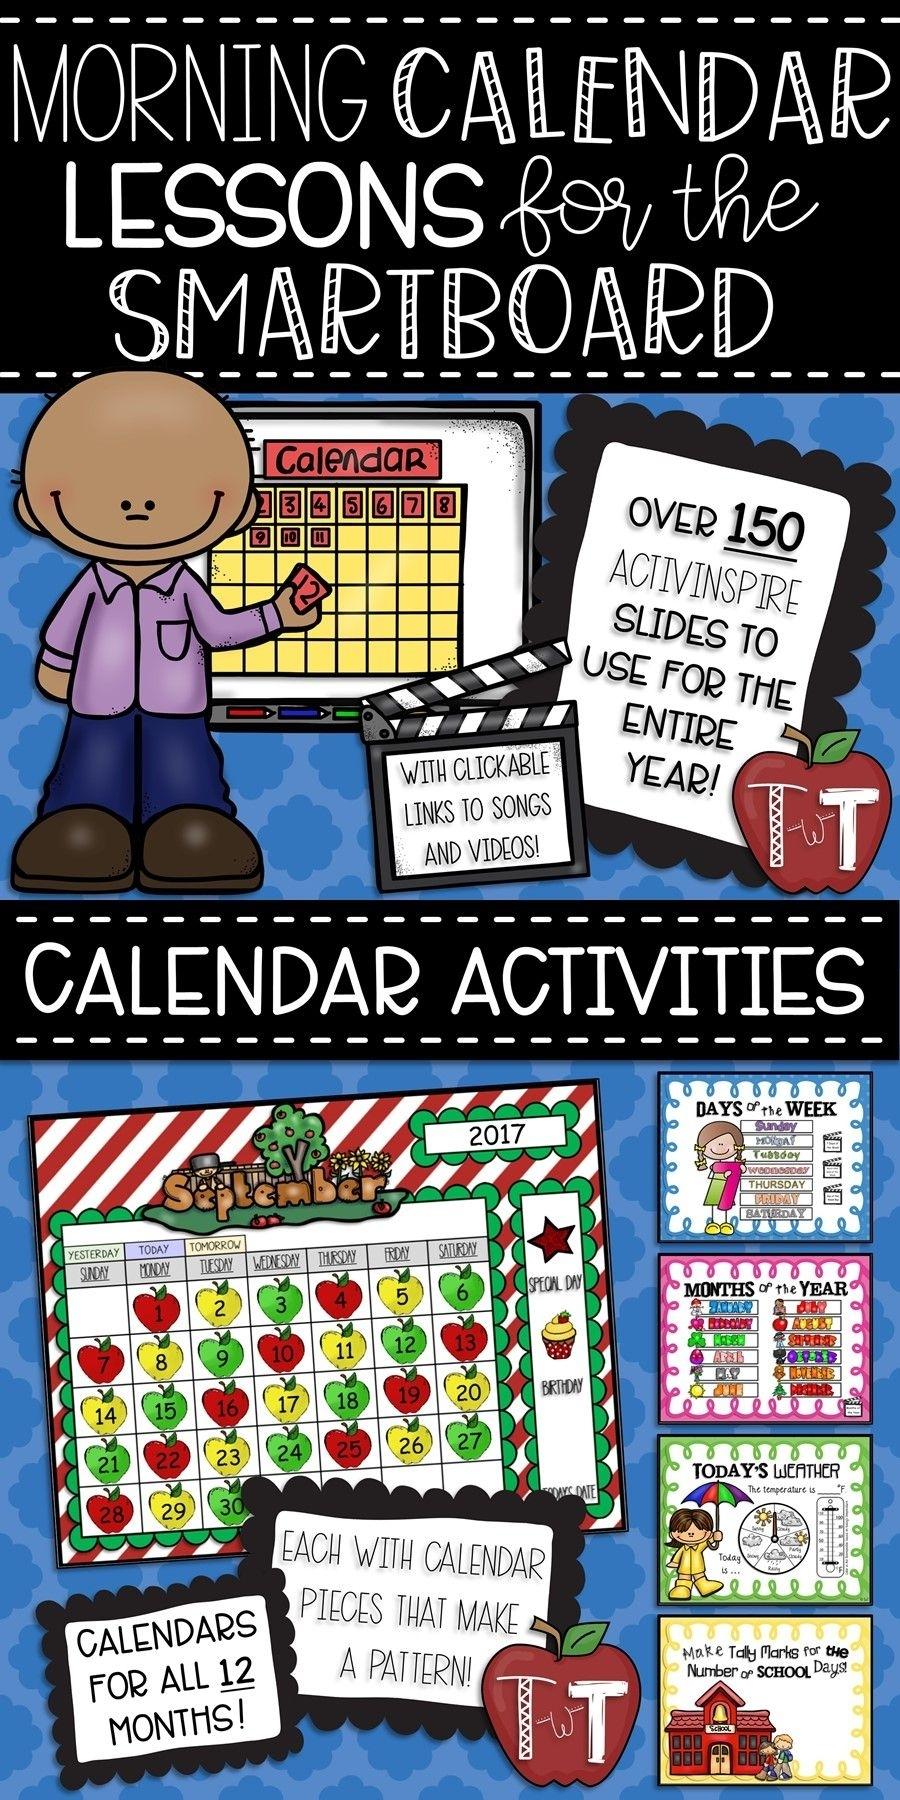 Morning Calendar Lessons For The Smartboard {Activinspire Flipchart Software}   Morning Calendar